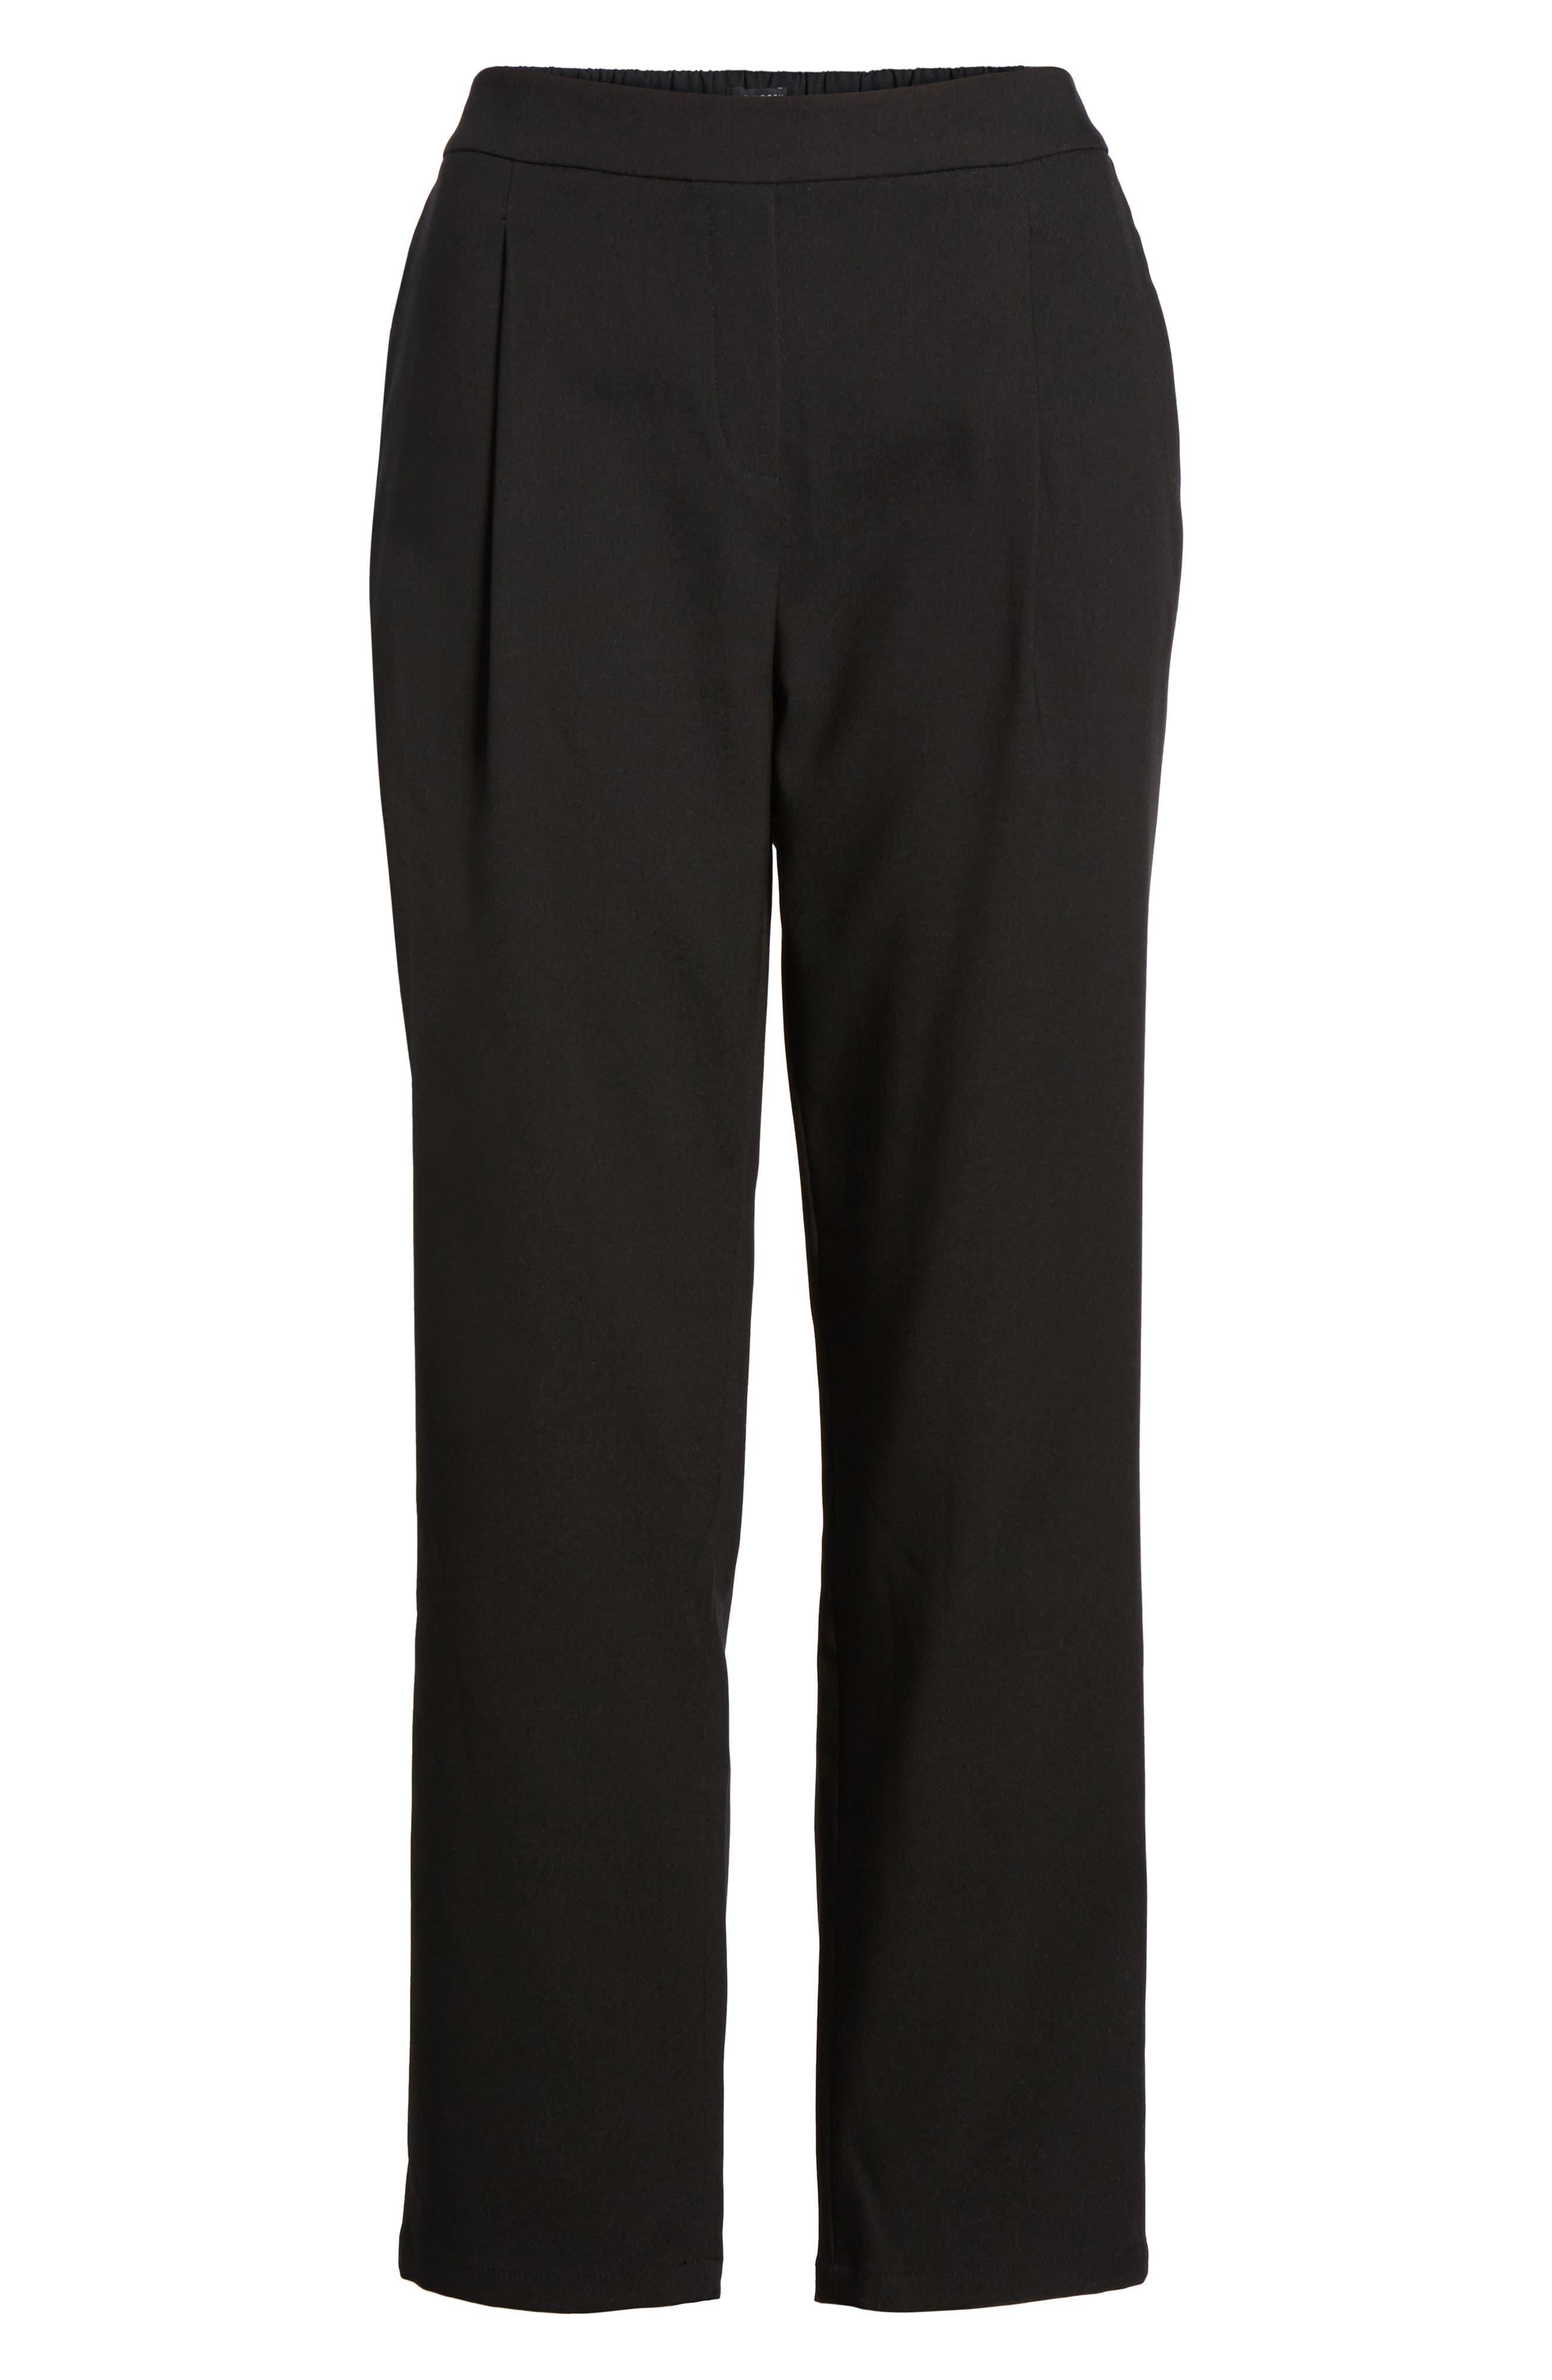 Twill Ankle Pants,                             Alternate thumbnail 6, color,                             Black